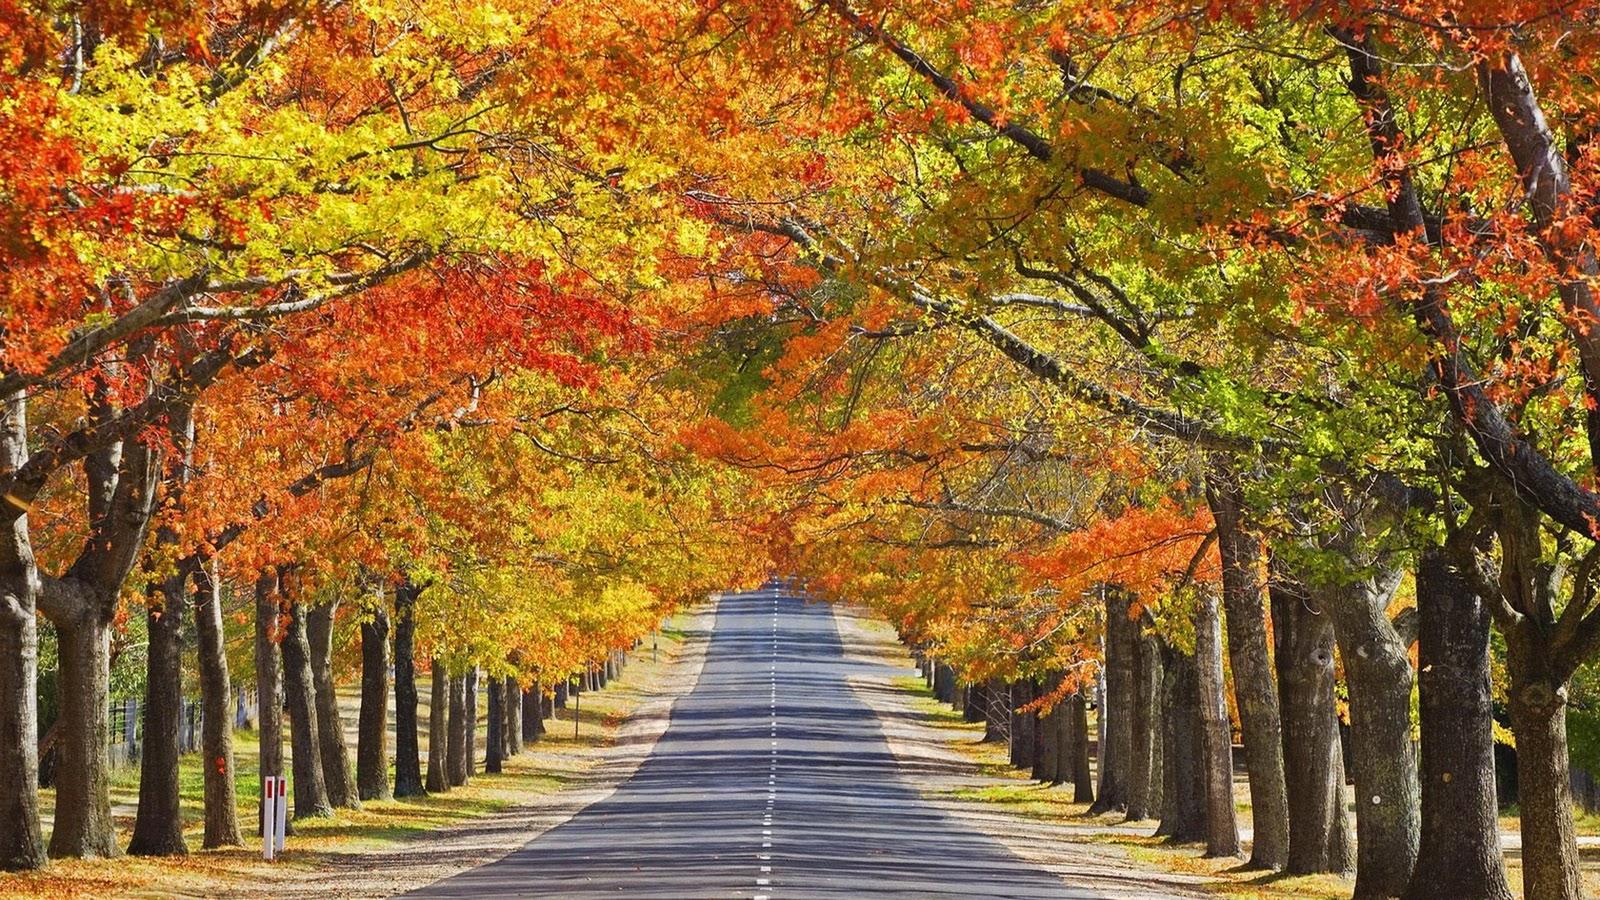 beautiful autumn season wallpaper hd beautiful autumn season wallpaper 1600x900